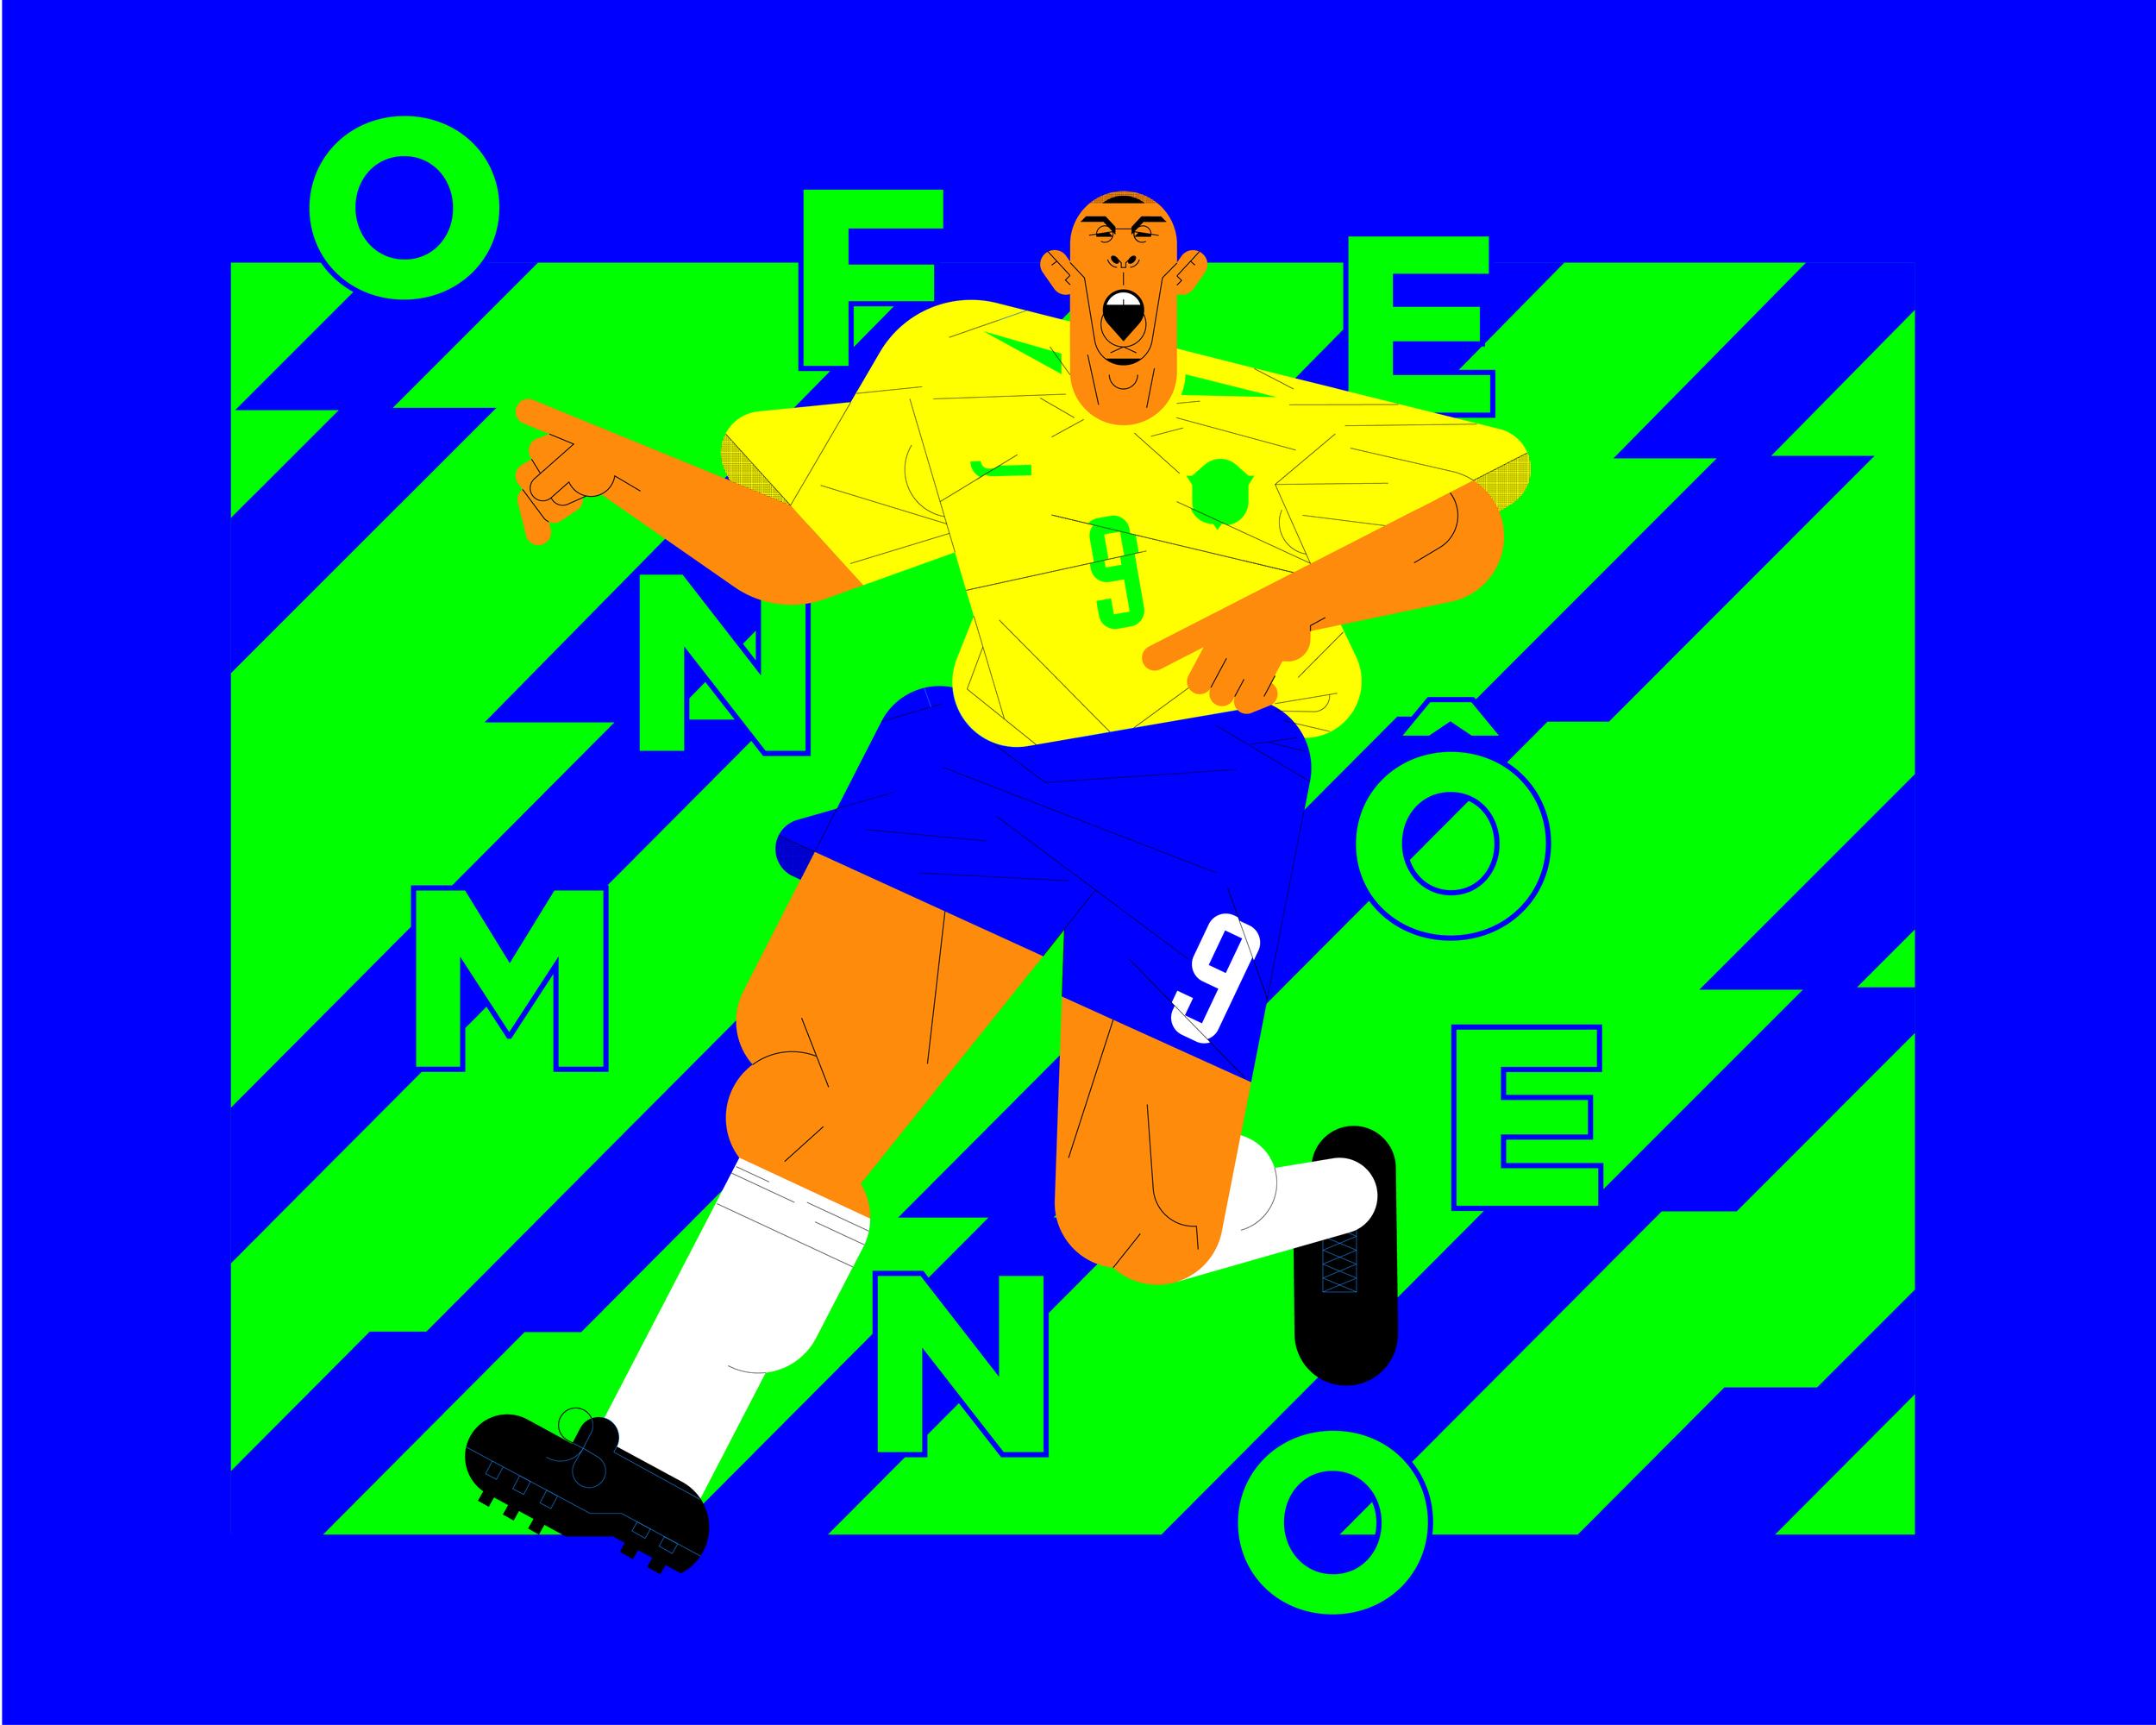 Football Players_Ronaldo 9 studies_brazil.png